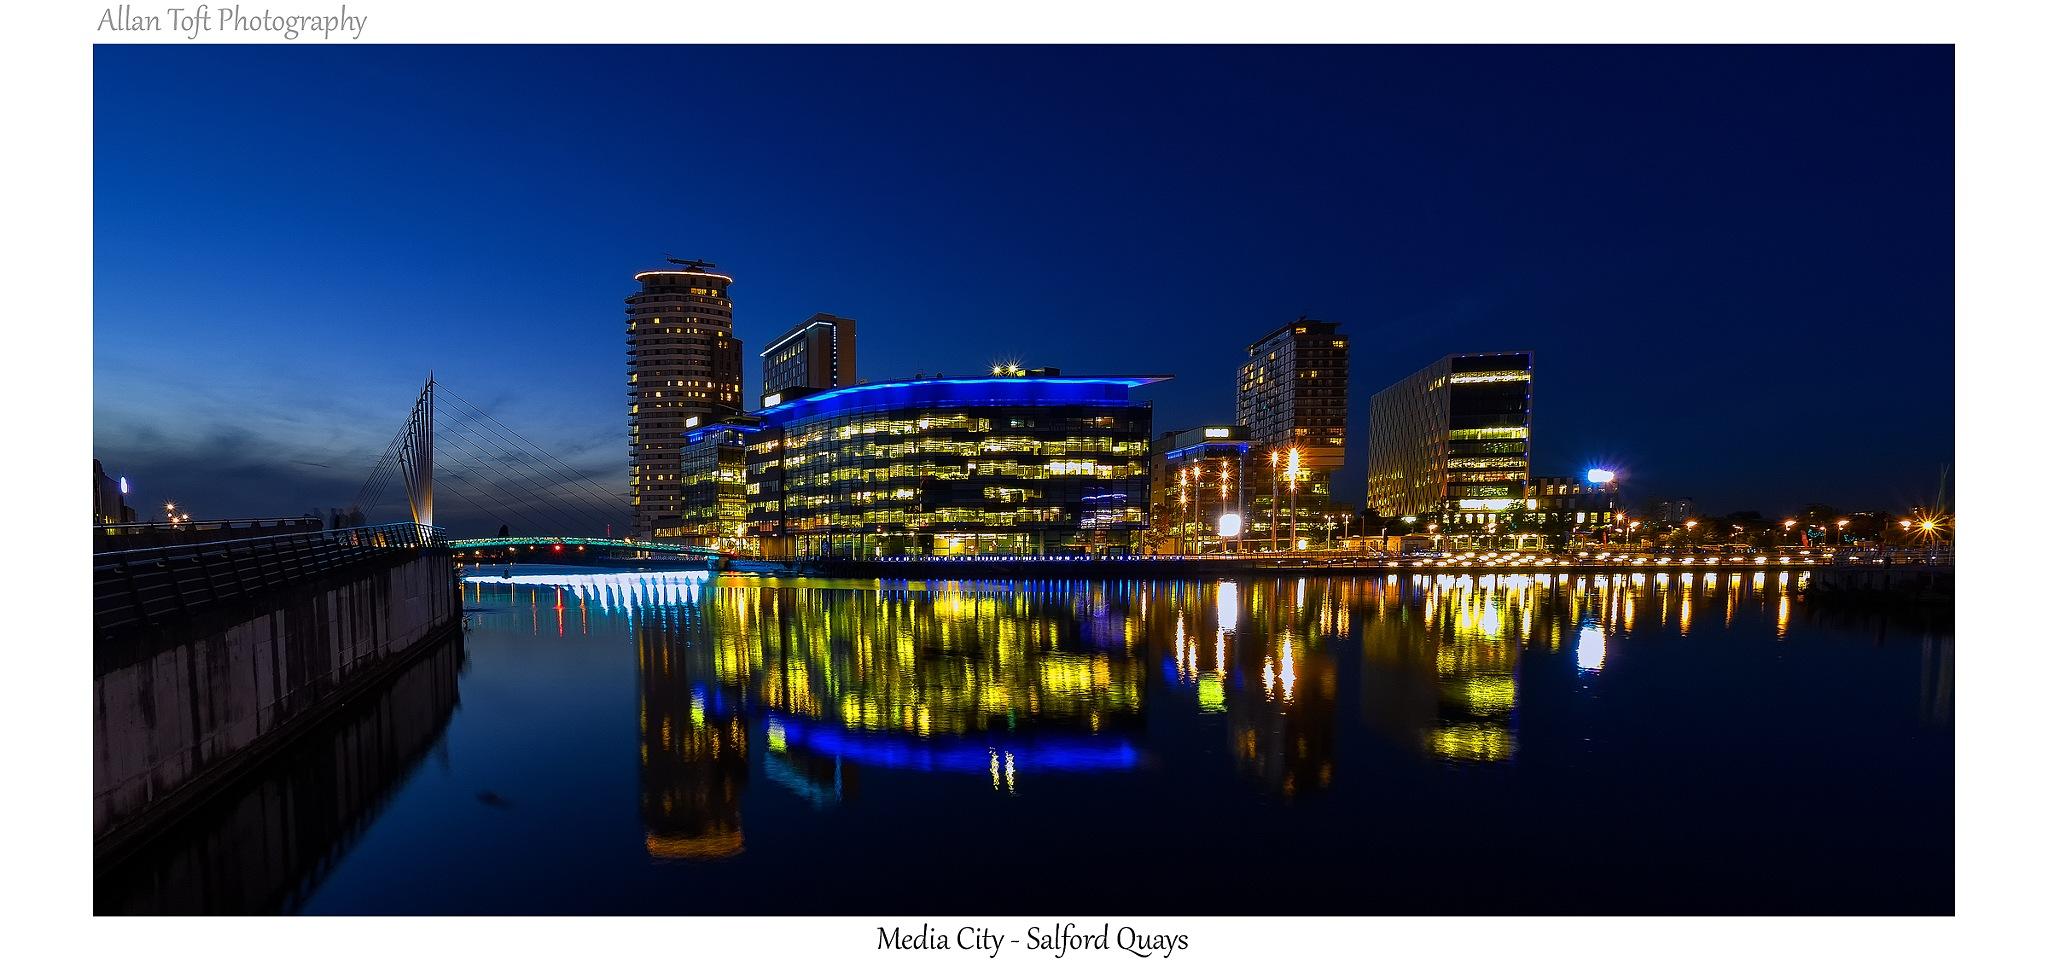 Salford Quays by Allan Toft